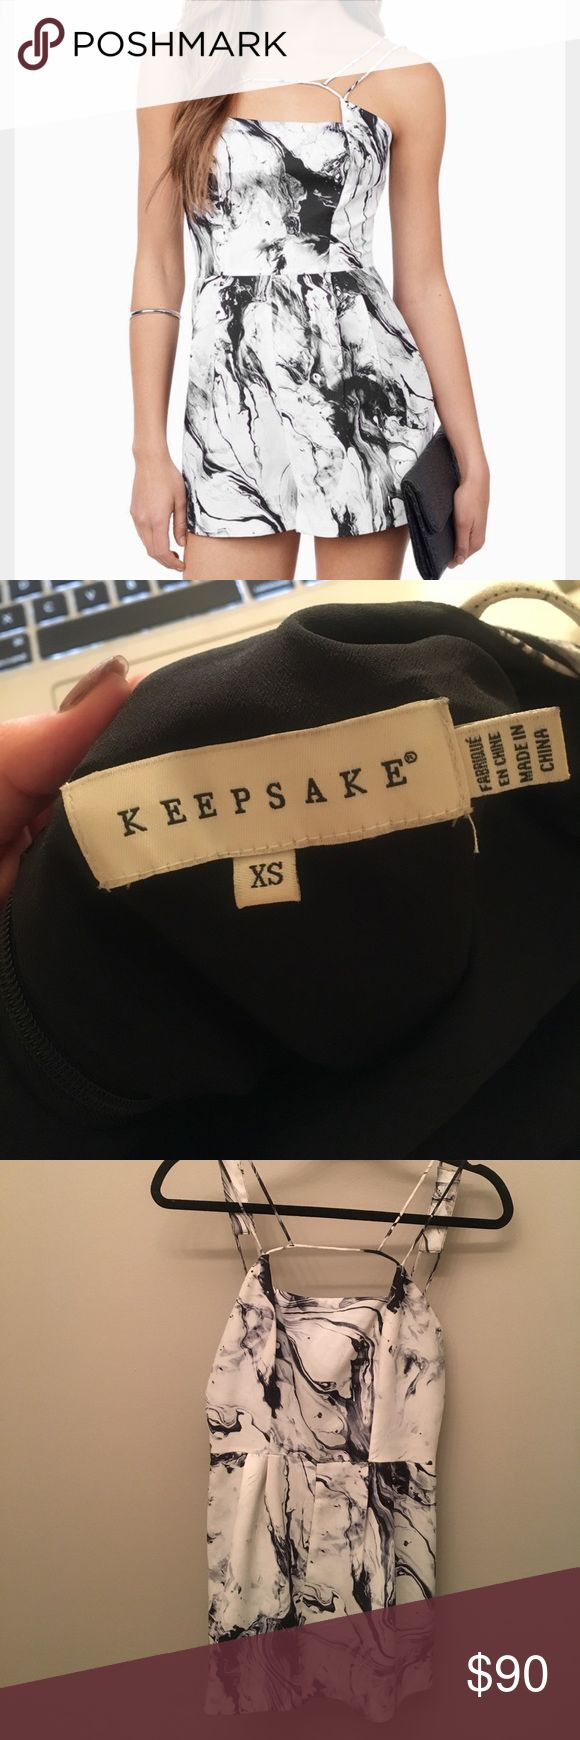 Keepsake Marble Romper Keepsake Marble Printed Romper KEEPSAKE the Label Dresses Mini